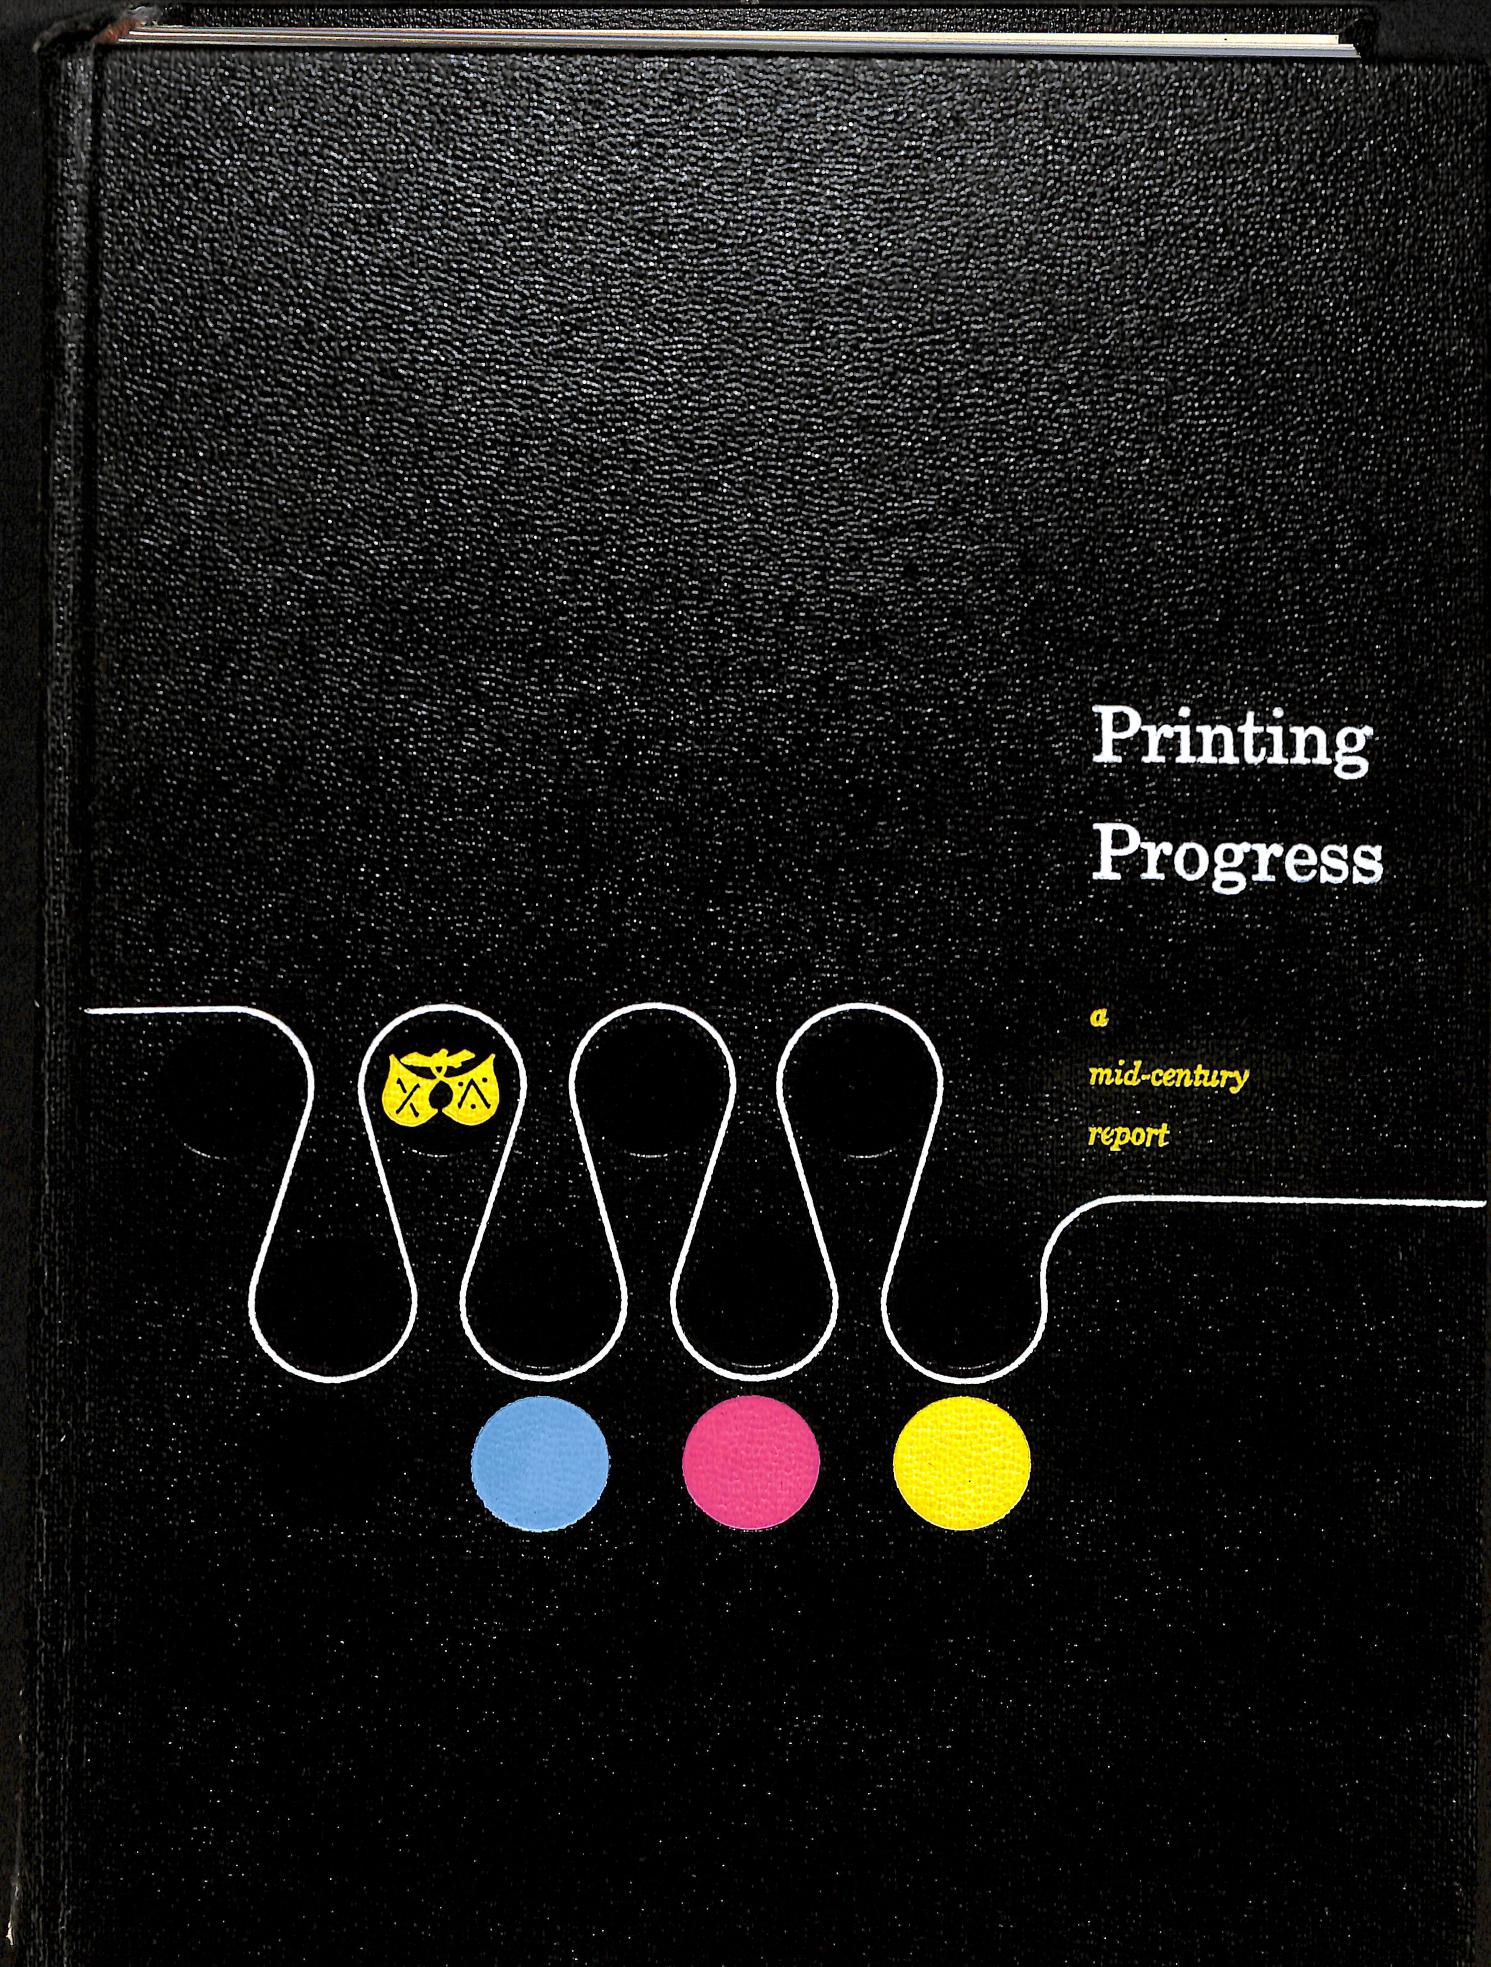 Printing Progress. A Mid-Century Report. PRINTING). [ ] (bi_9583290478) photo